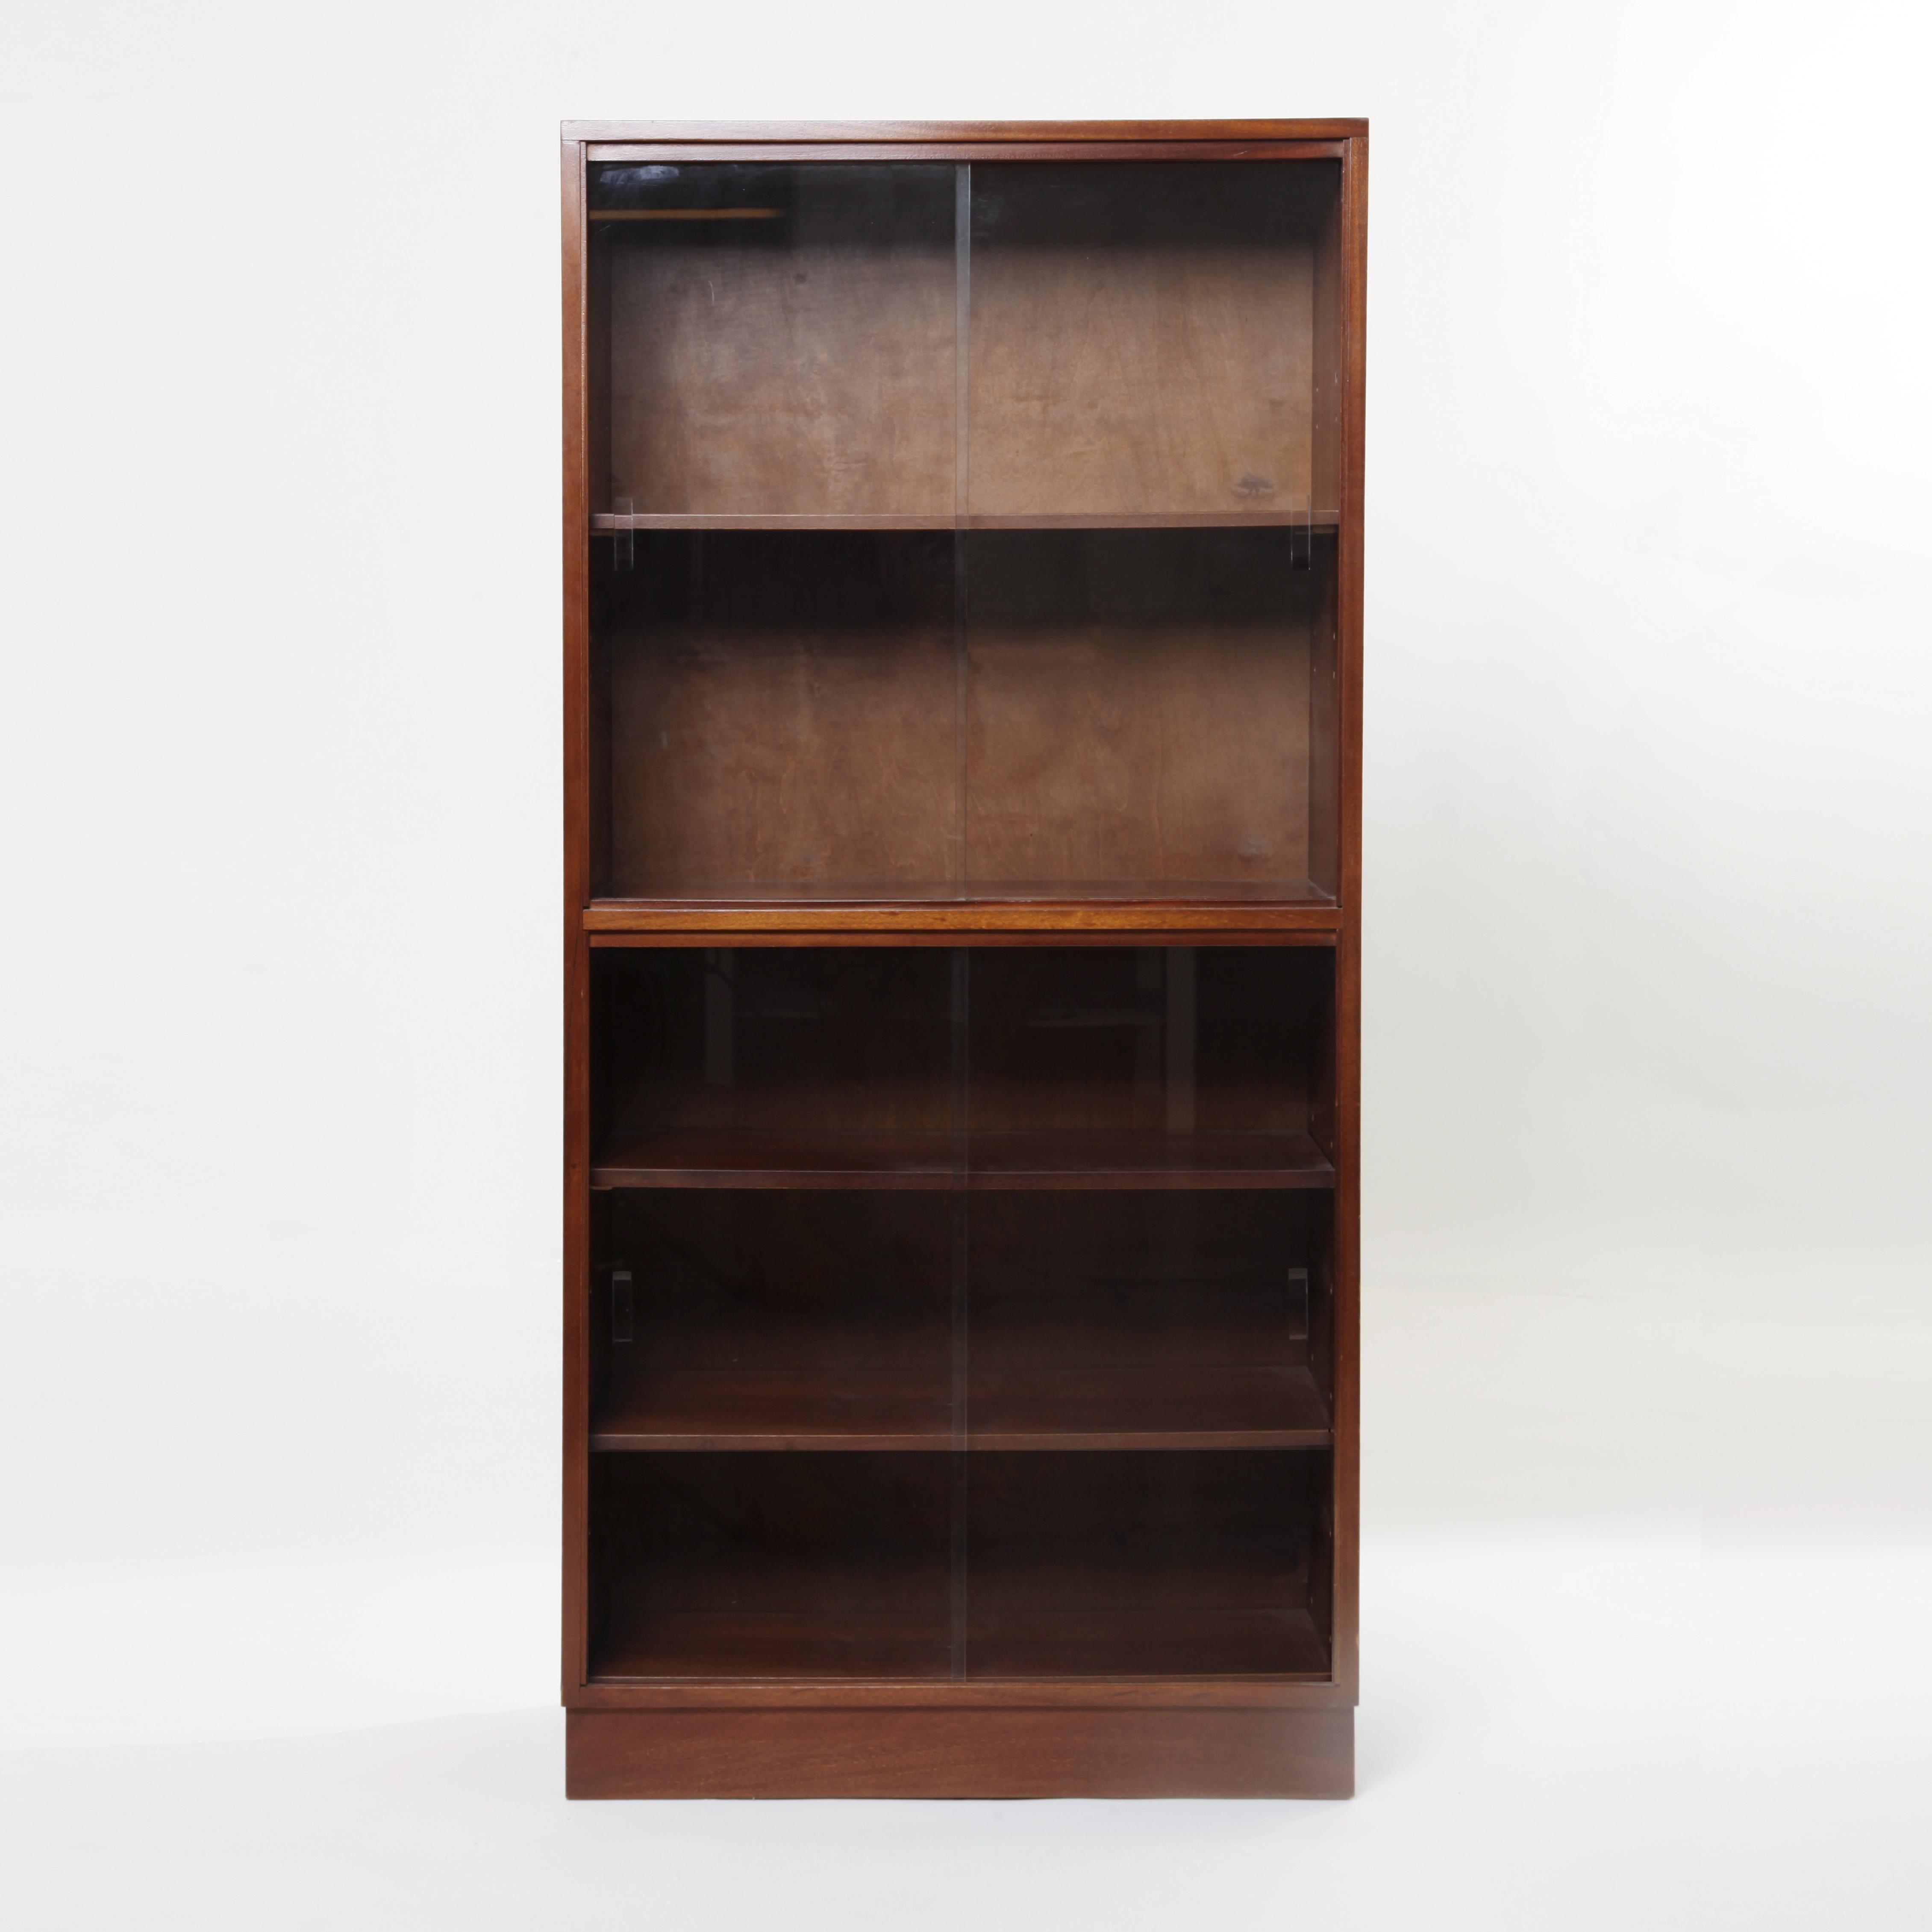 Superieur Mid Century Mahogany Display Cabinet Bookshelf, Shelving Unit